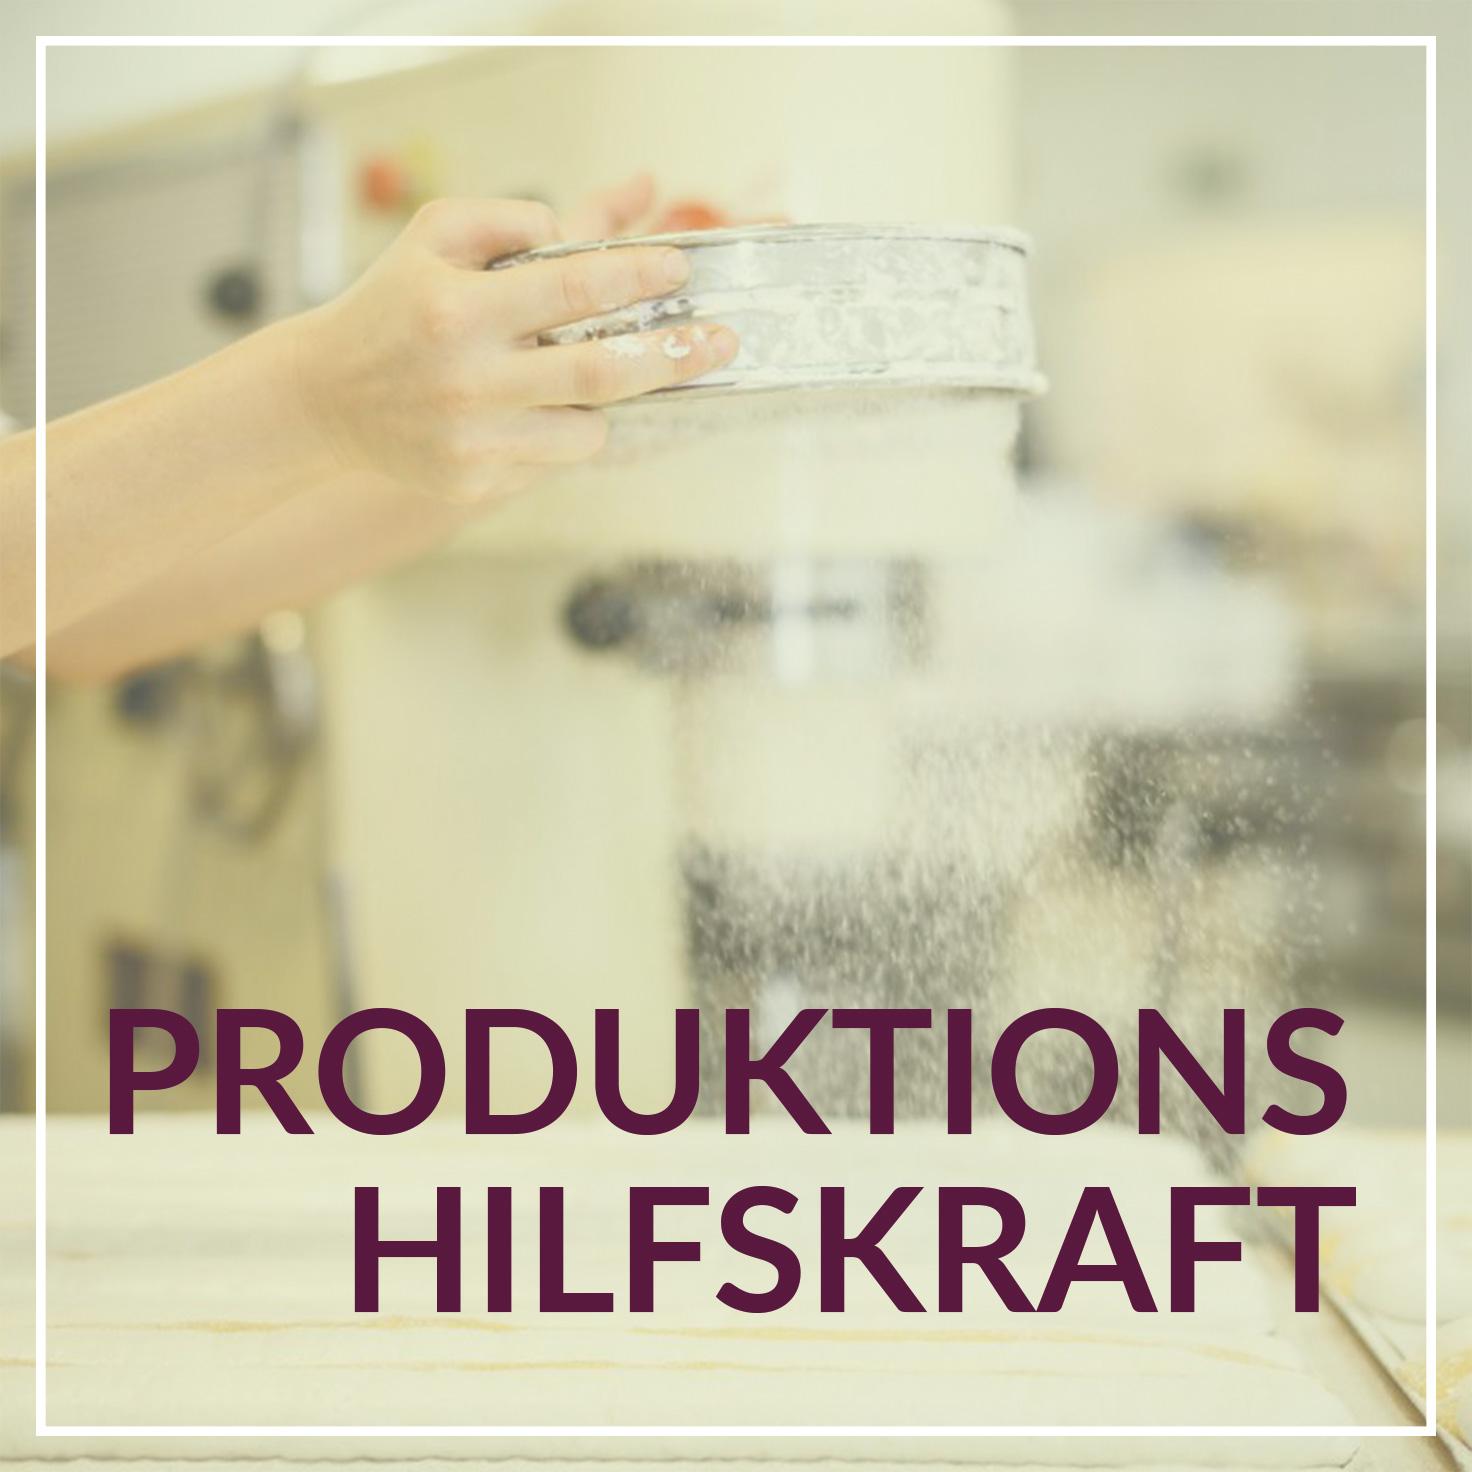 Heiss & Süß Jobs - Produktionshilfskraft